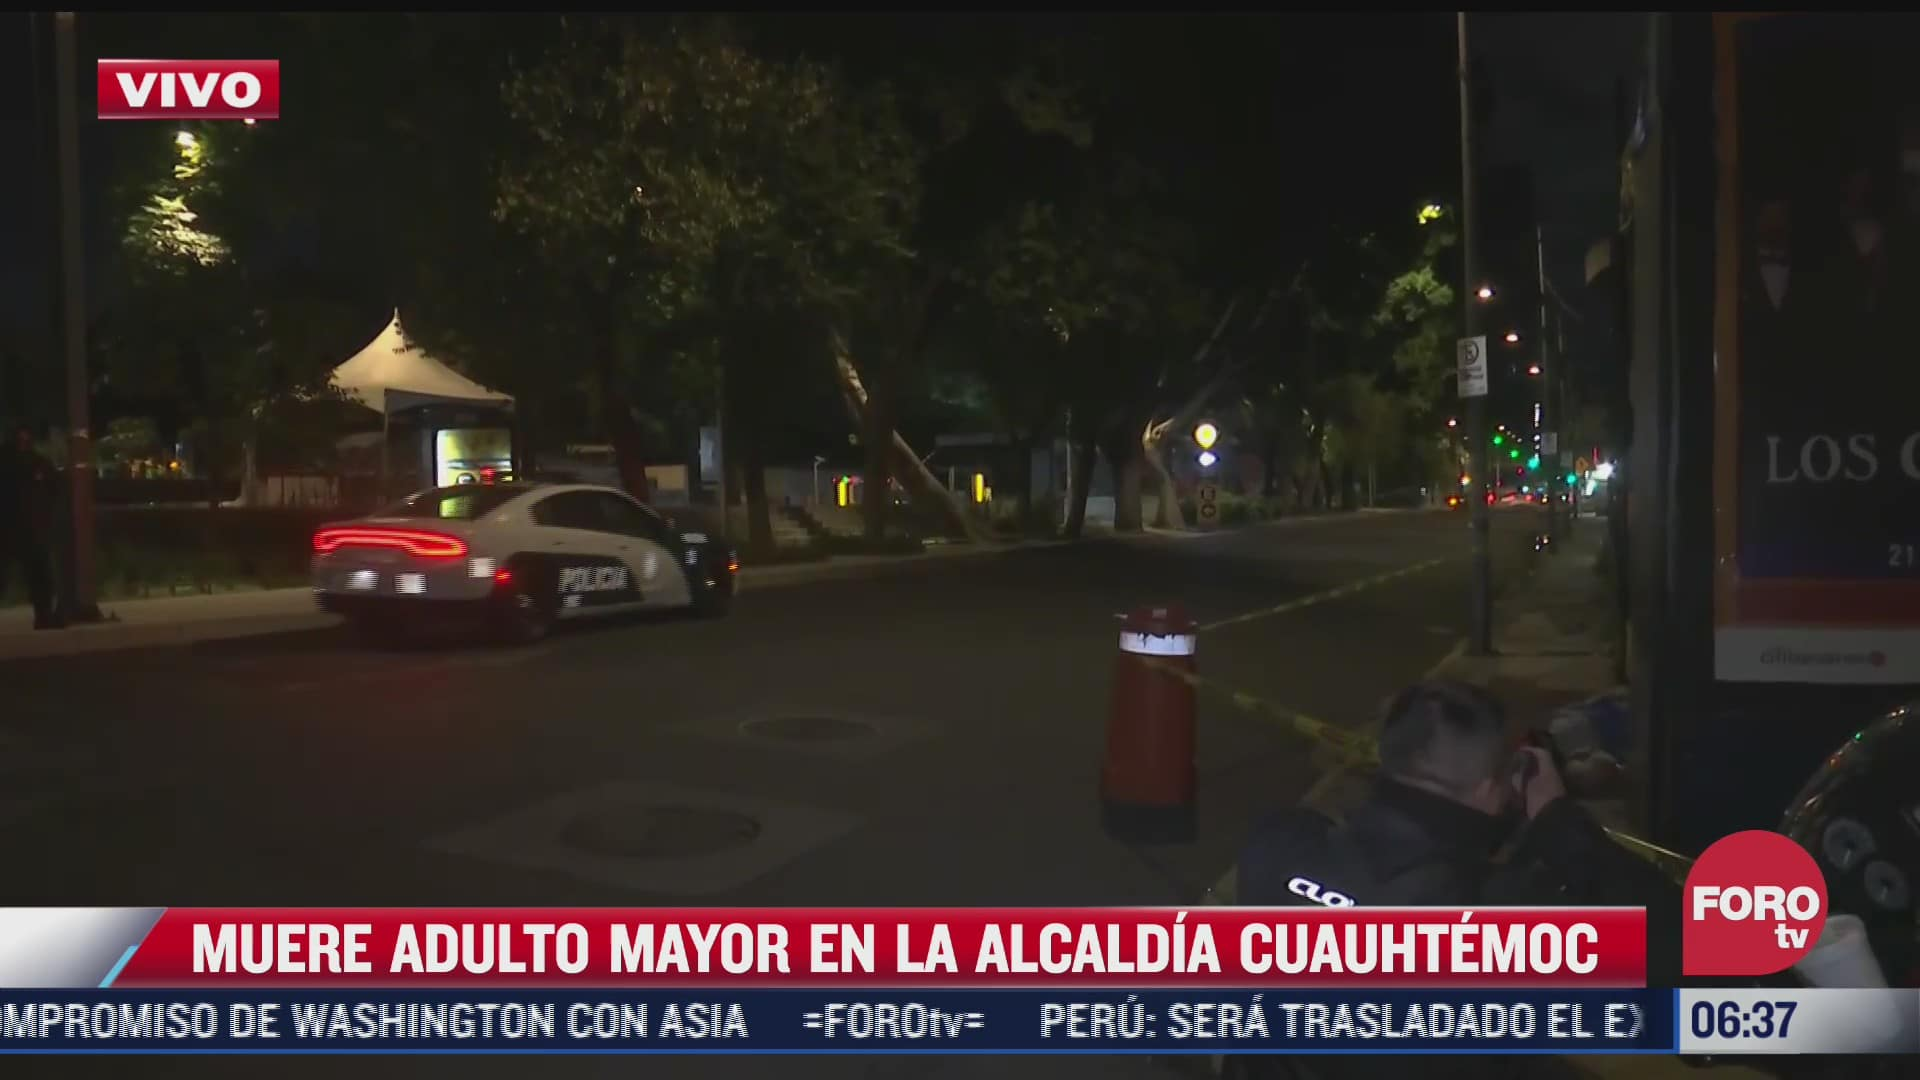 muere adulto mayor en calles de la alcaldia cuauhtemoc cdmx